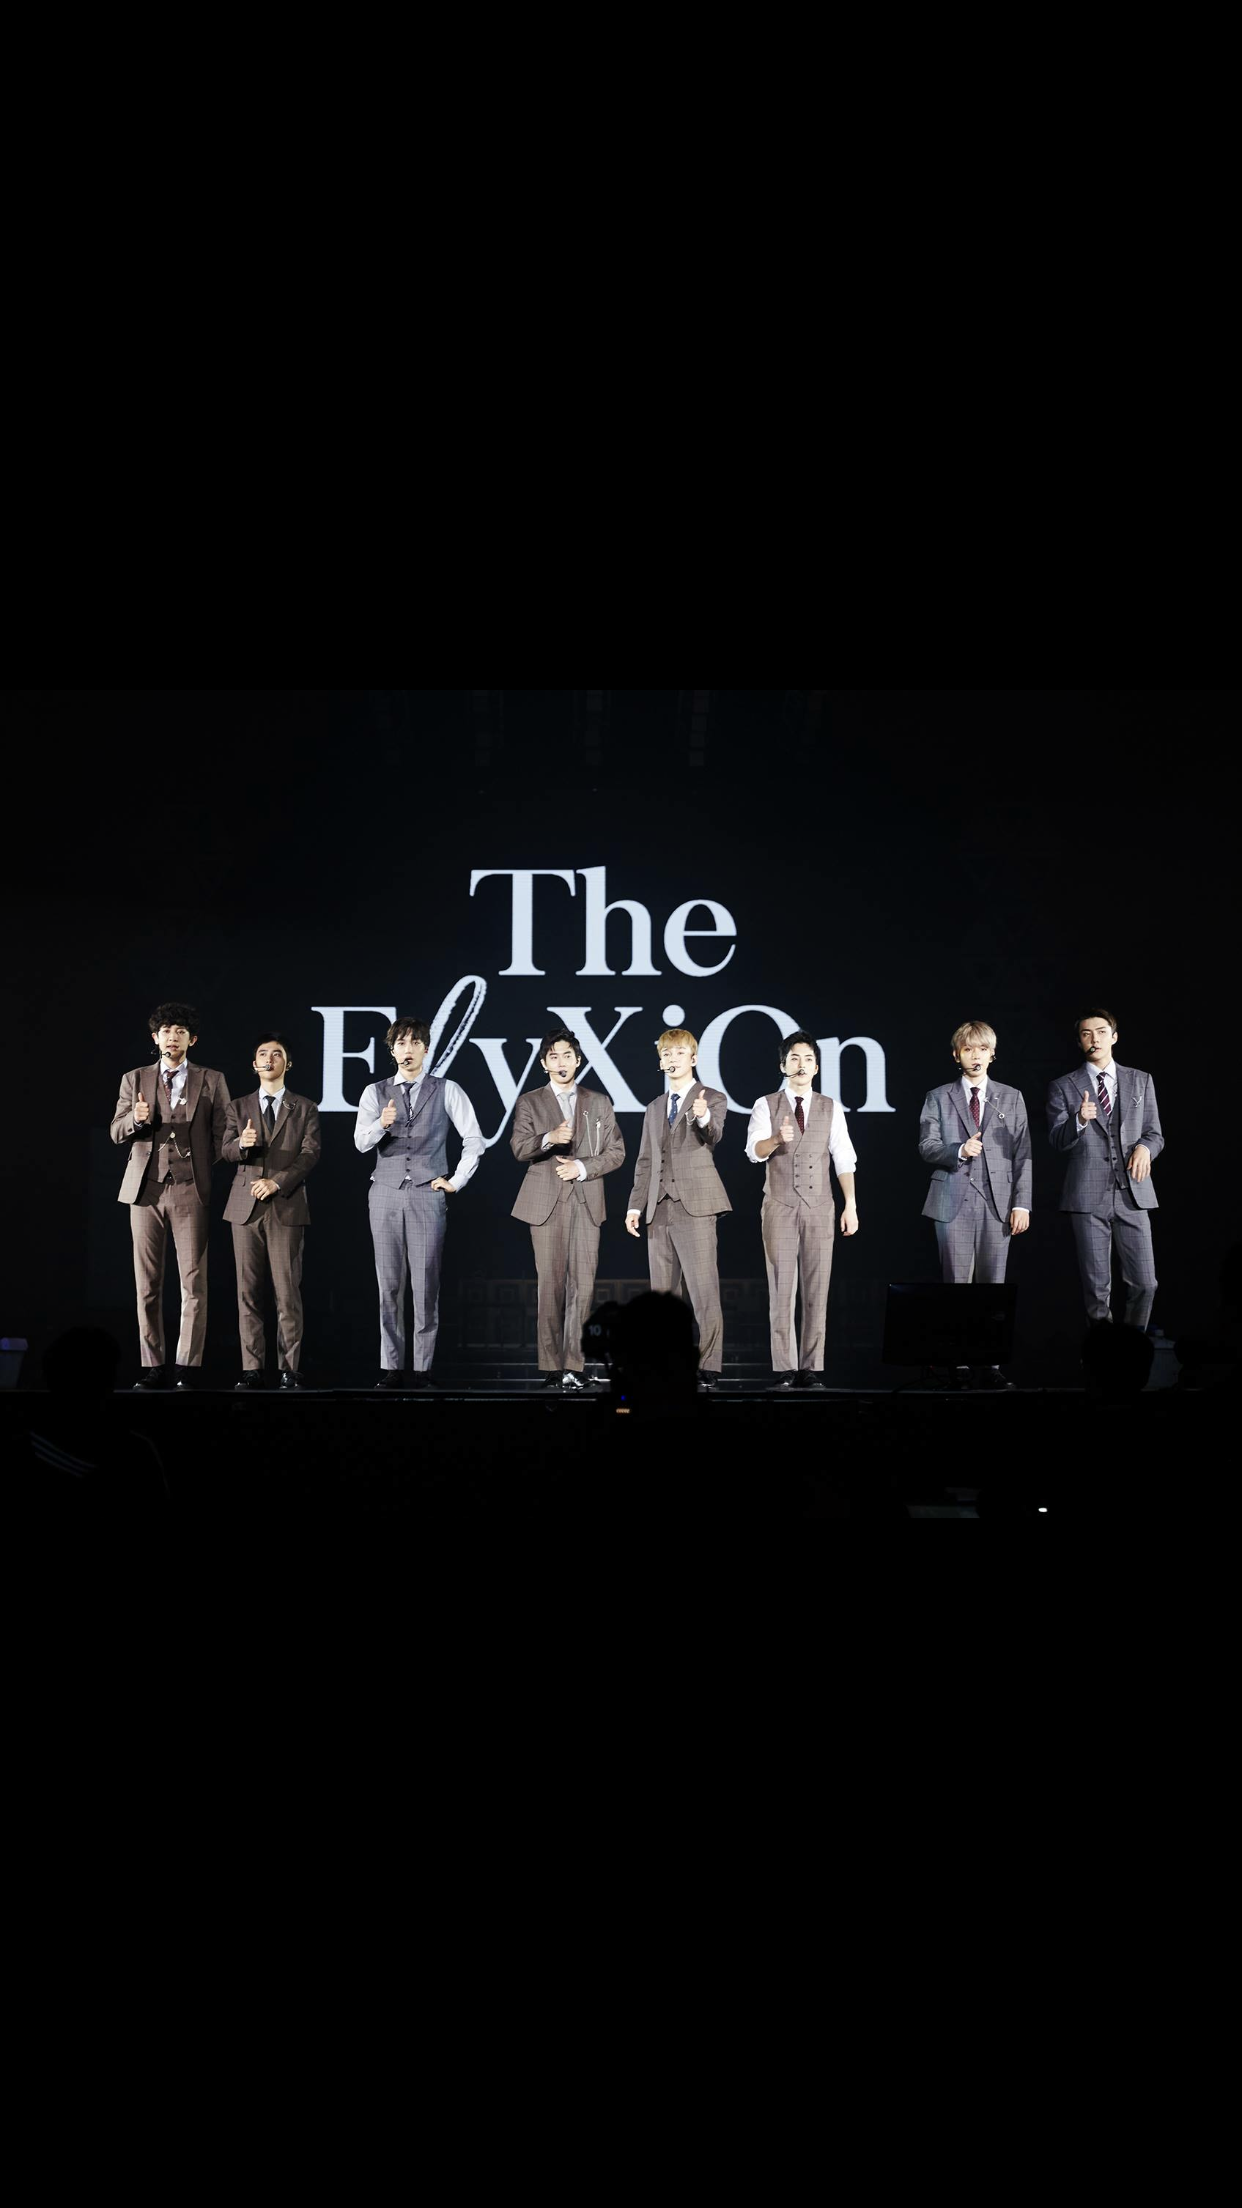 Exo Exo Elyxion Concert King Of Kpop Idol Singer Dancer Xiumin Suho Lay Baekhyun Chen Chanyeol Kyungsoo Do Kai Sehun Ot9 Exo Idol Exo Chen